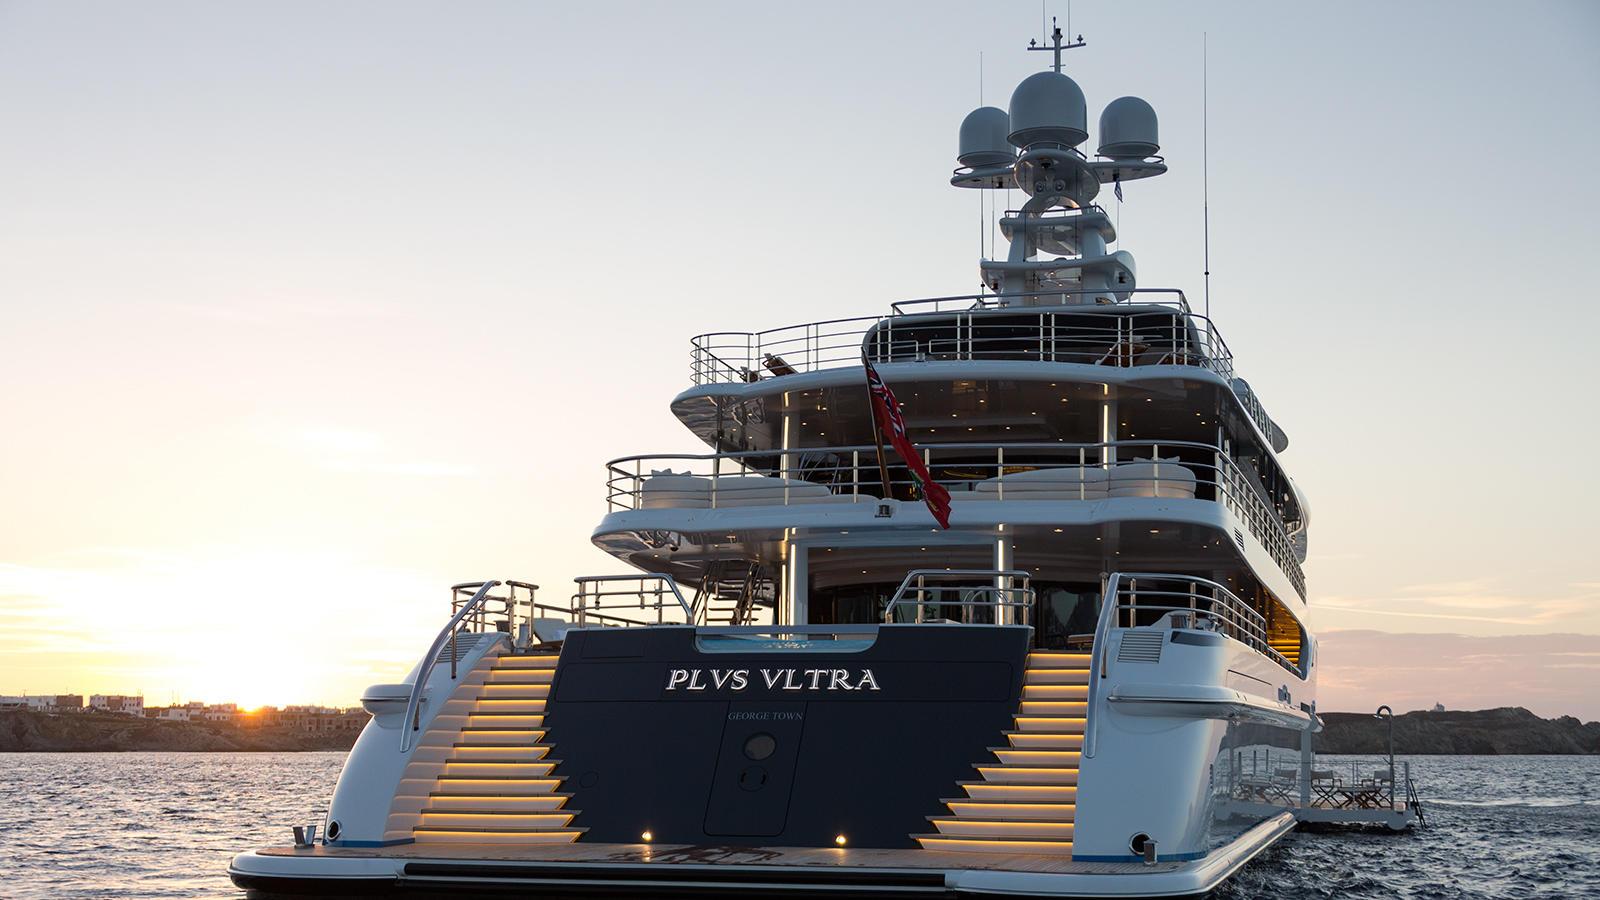 5em9sLThQrOAFvs3TMdK_Plvs-Vltra-Amels-LE242-yacht-aft-view-credit-Jeff-Brown-1600x900